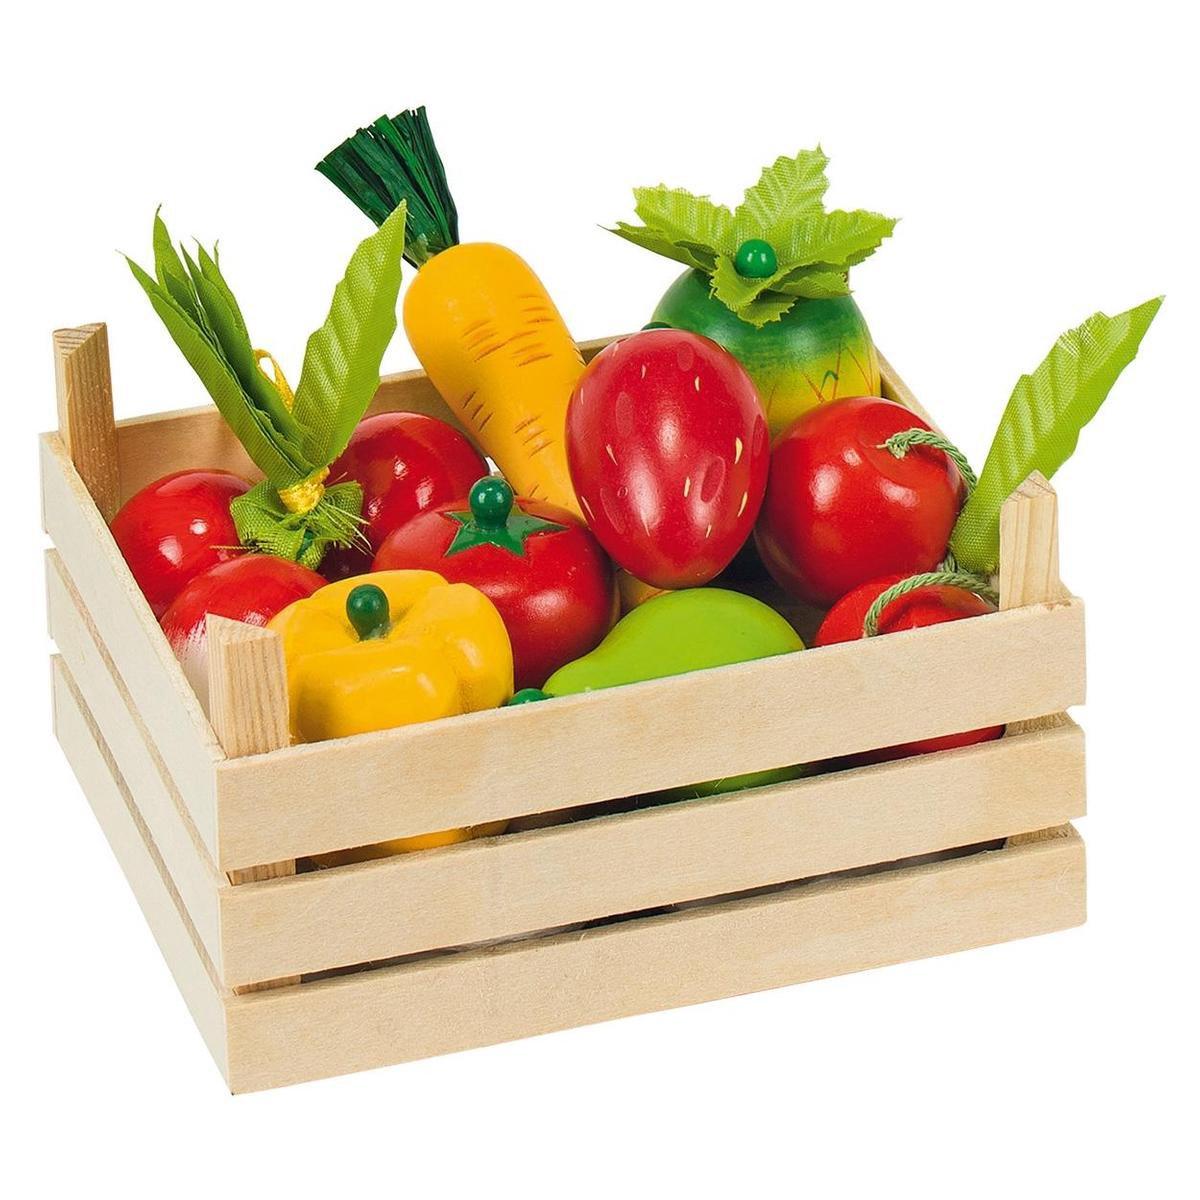 Goki Kistje met groente en fruit - 10-delig - Goki